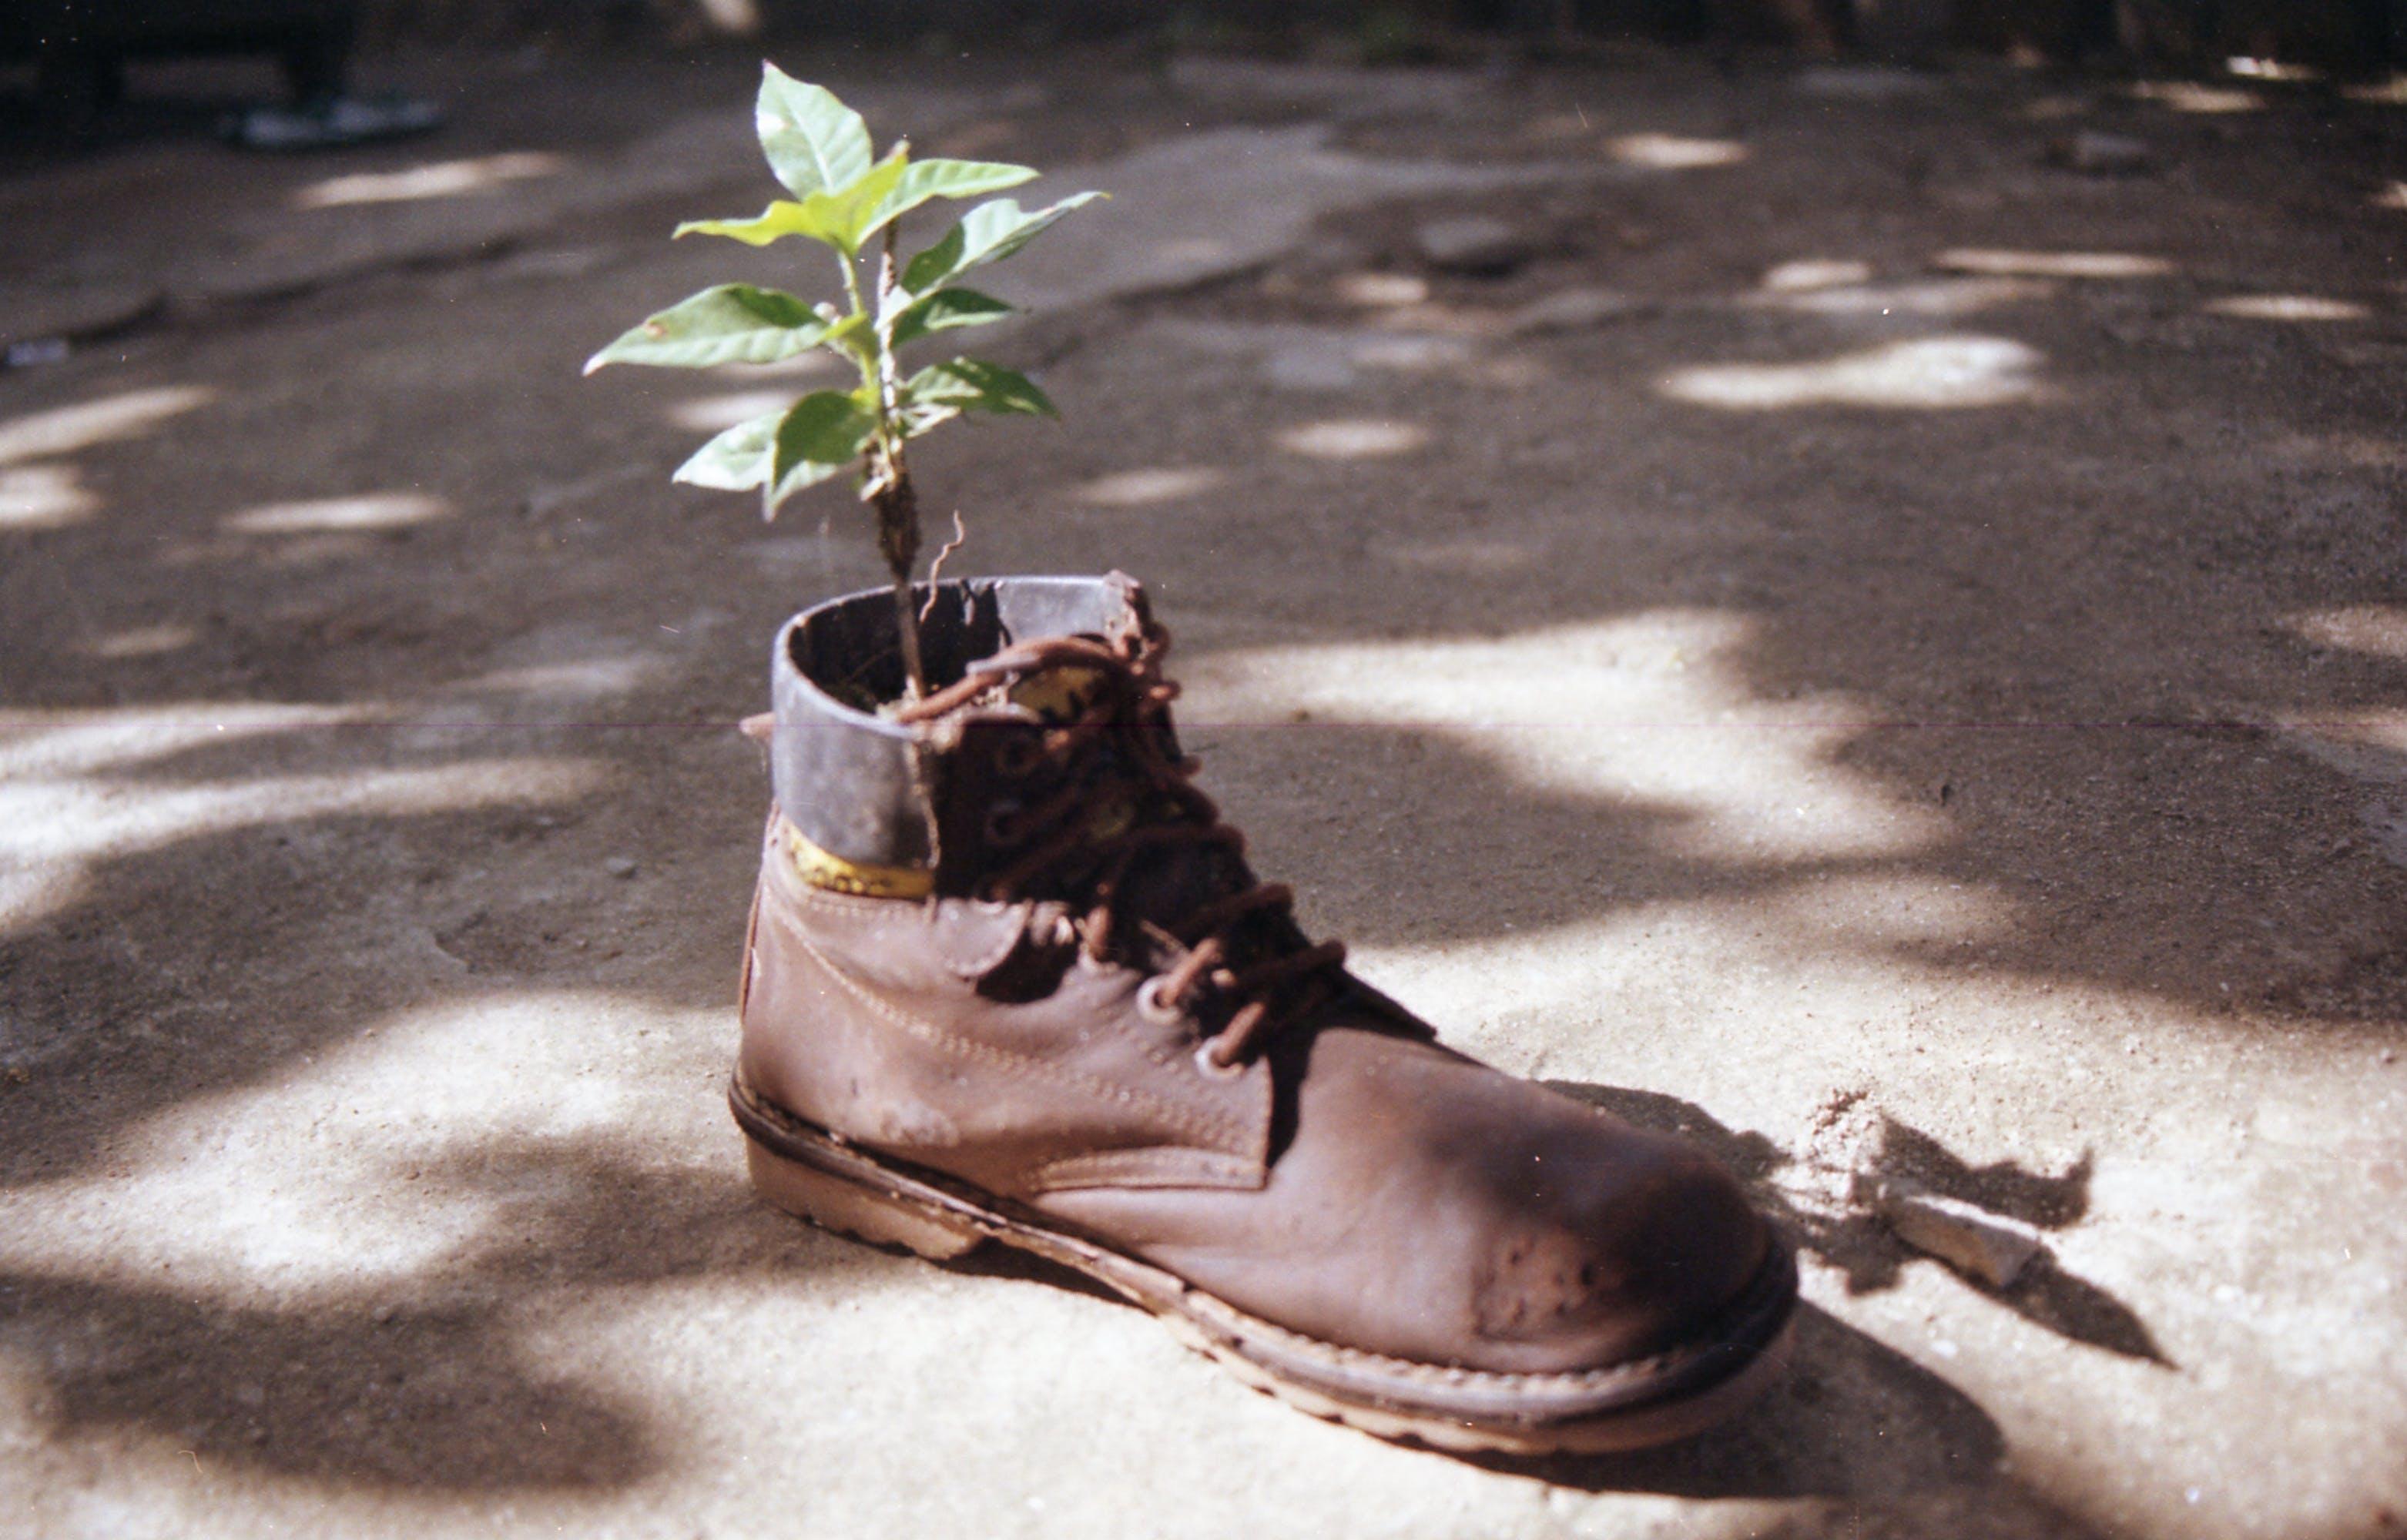 Kostenloses Stock Foto zu grünes blatt, lederschuhe, lederstiefel, pflanze